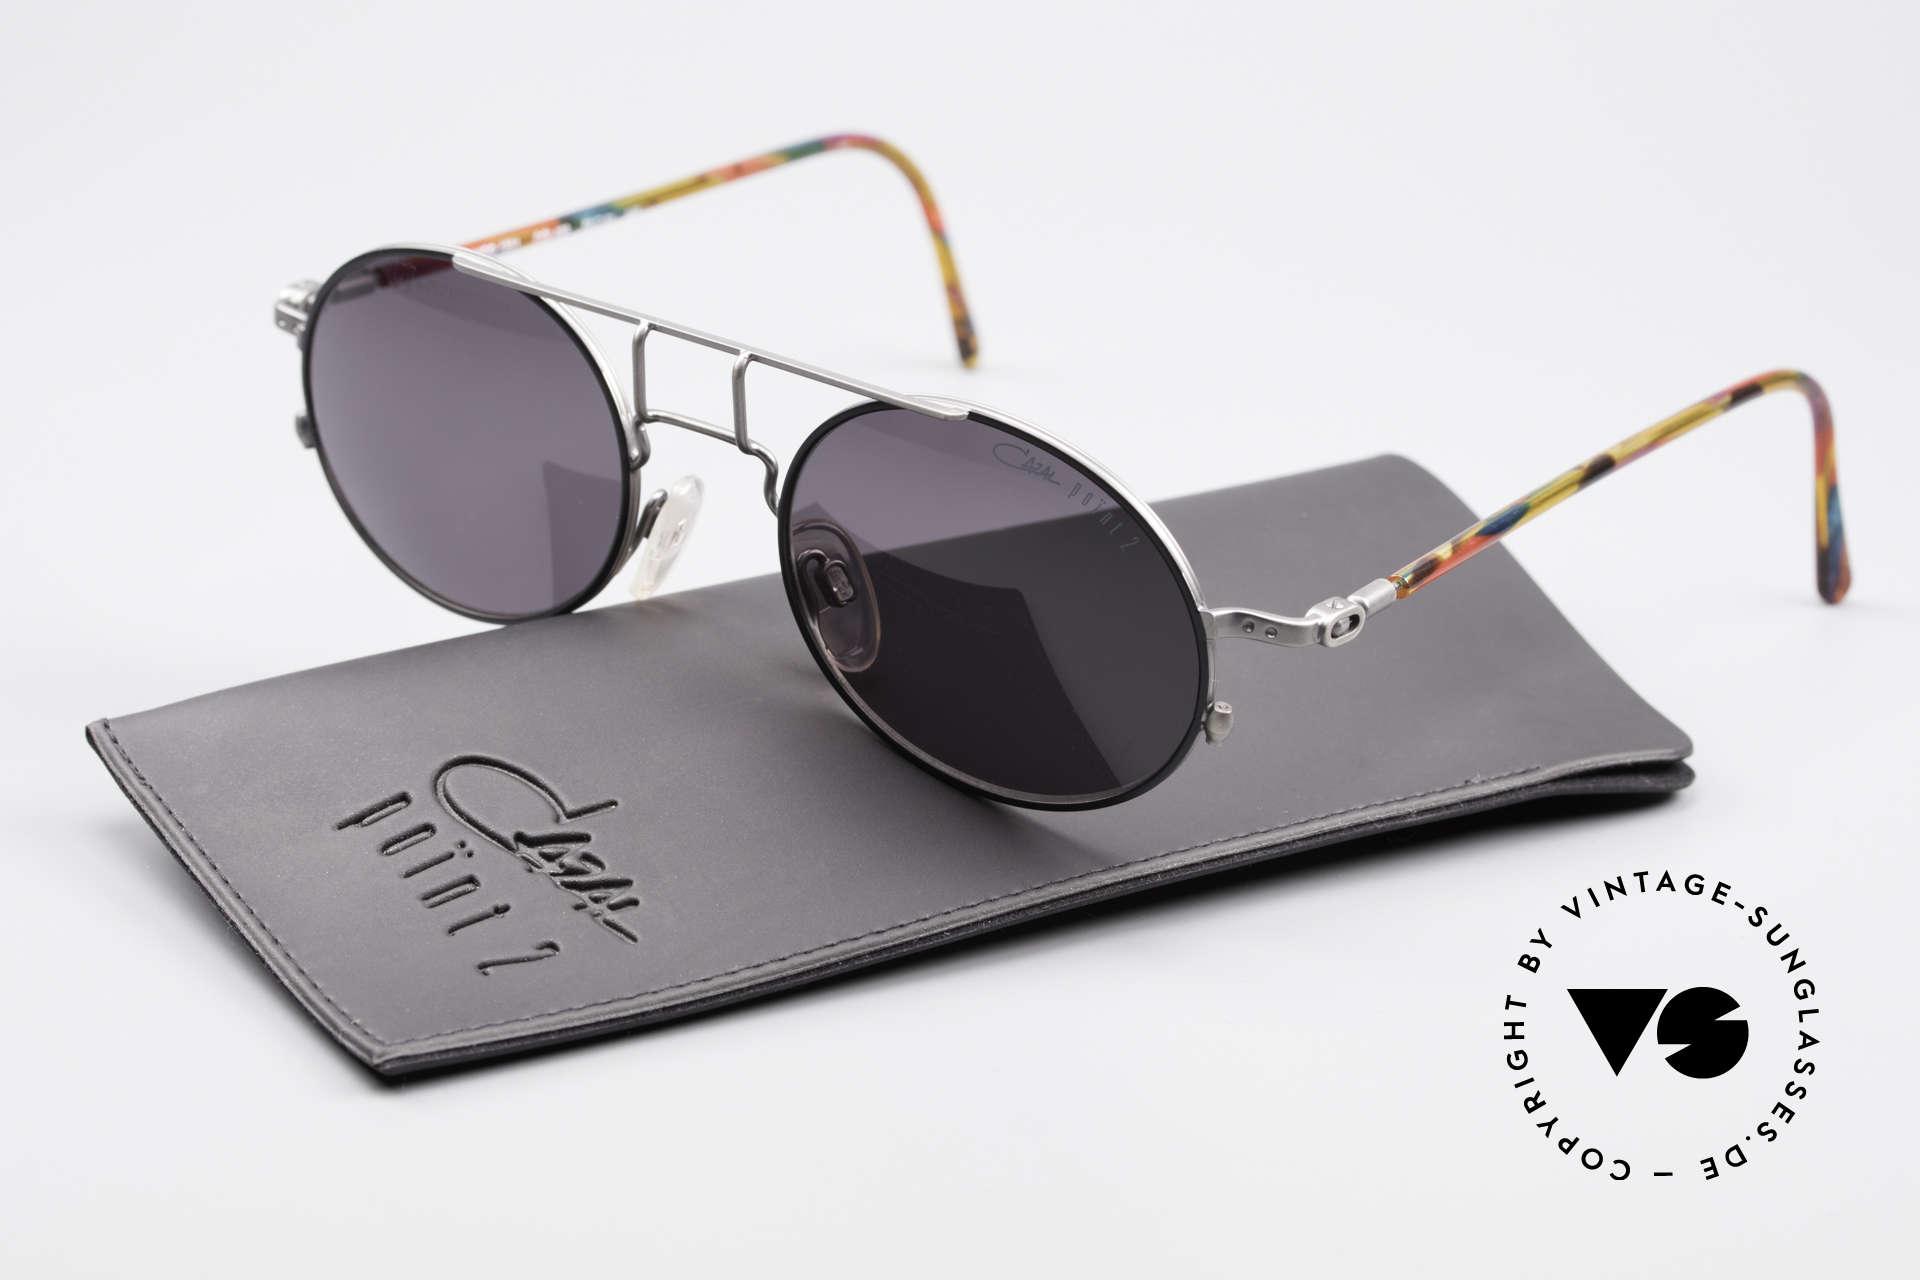 Cazal 1201 - Point 2 90's Industrial Style Shades, dark gray CAZAL sun lenses (for 100% UV protection), Made for Men